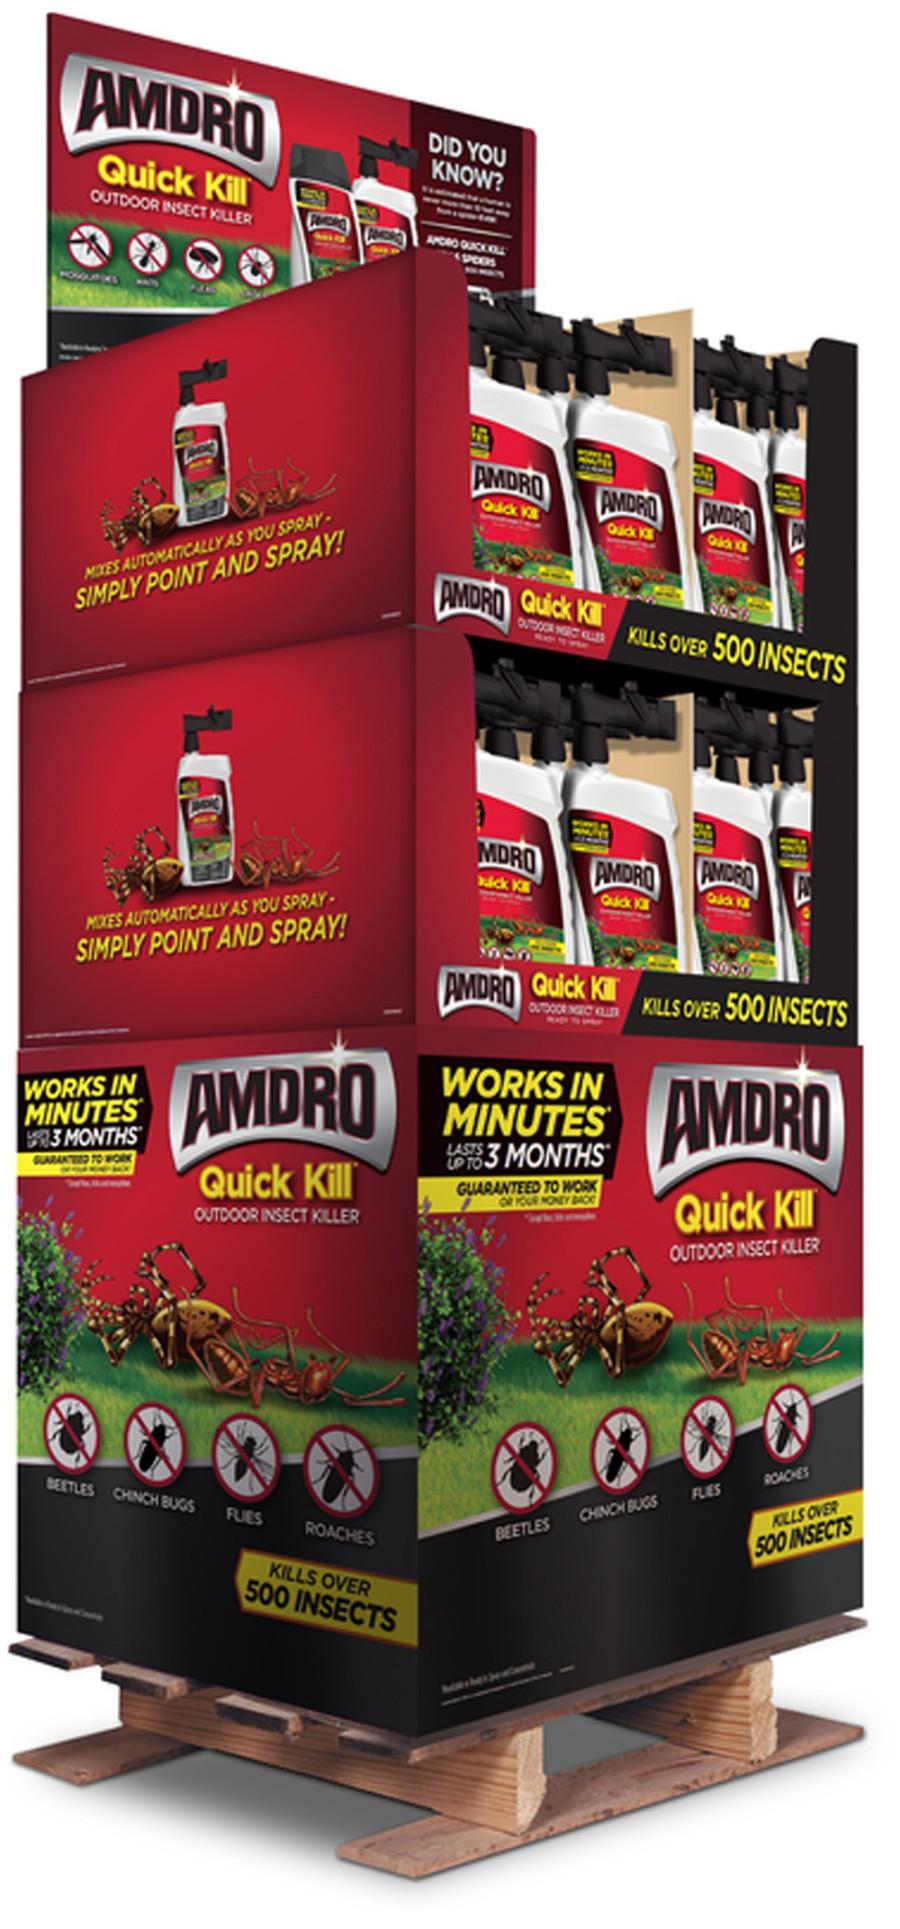 Amdro Quick Kill Outdoor Insect Killer Ready to Spray Quarter Pallet Display 48ea/32 oz